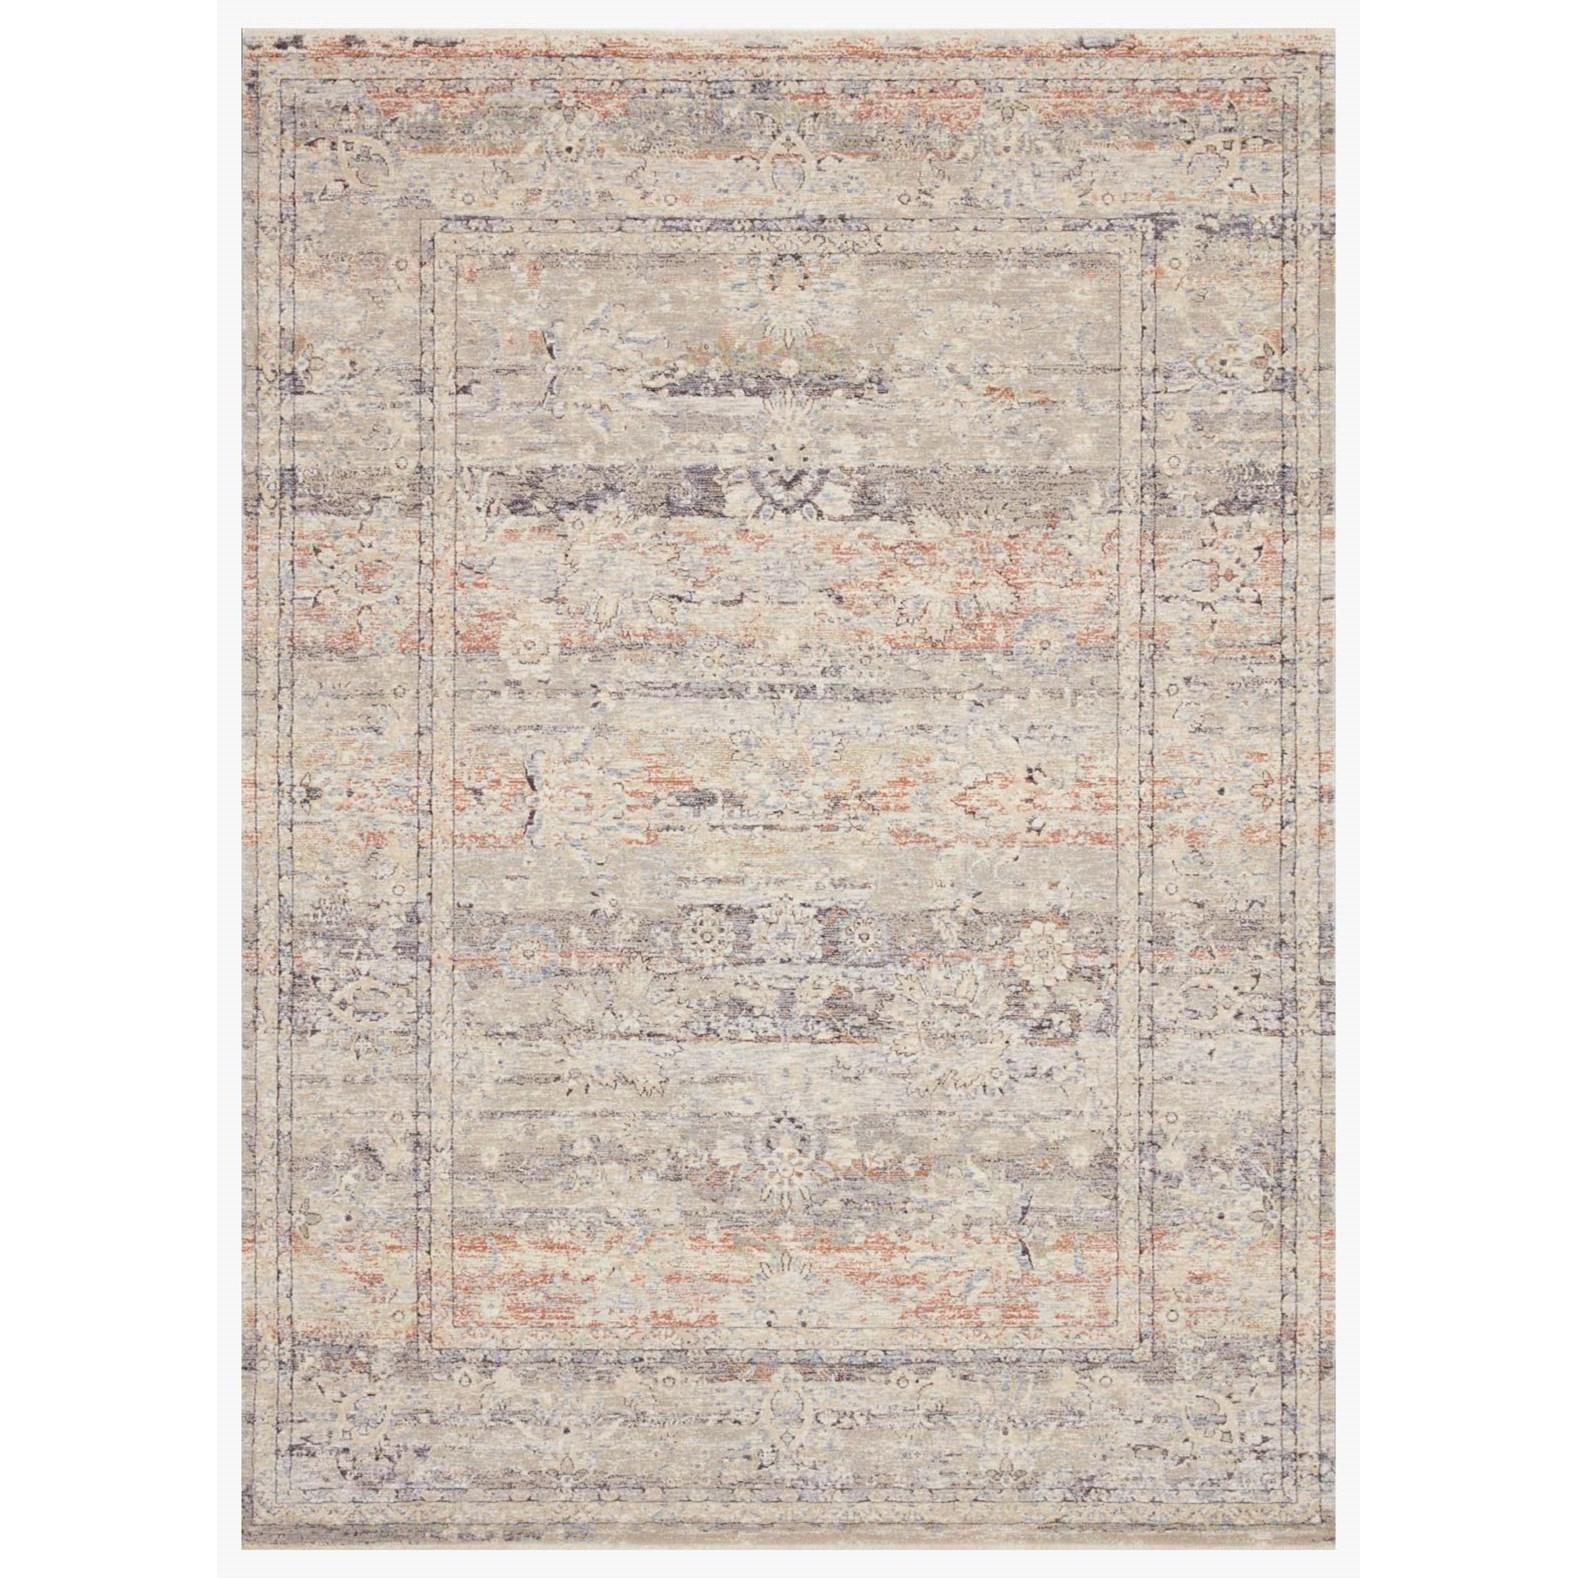 "Faye 11'6"" x 15'7"" Denim / Rust Rug by Loloi Rugs at Virginia Furniture Market"